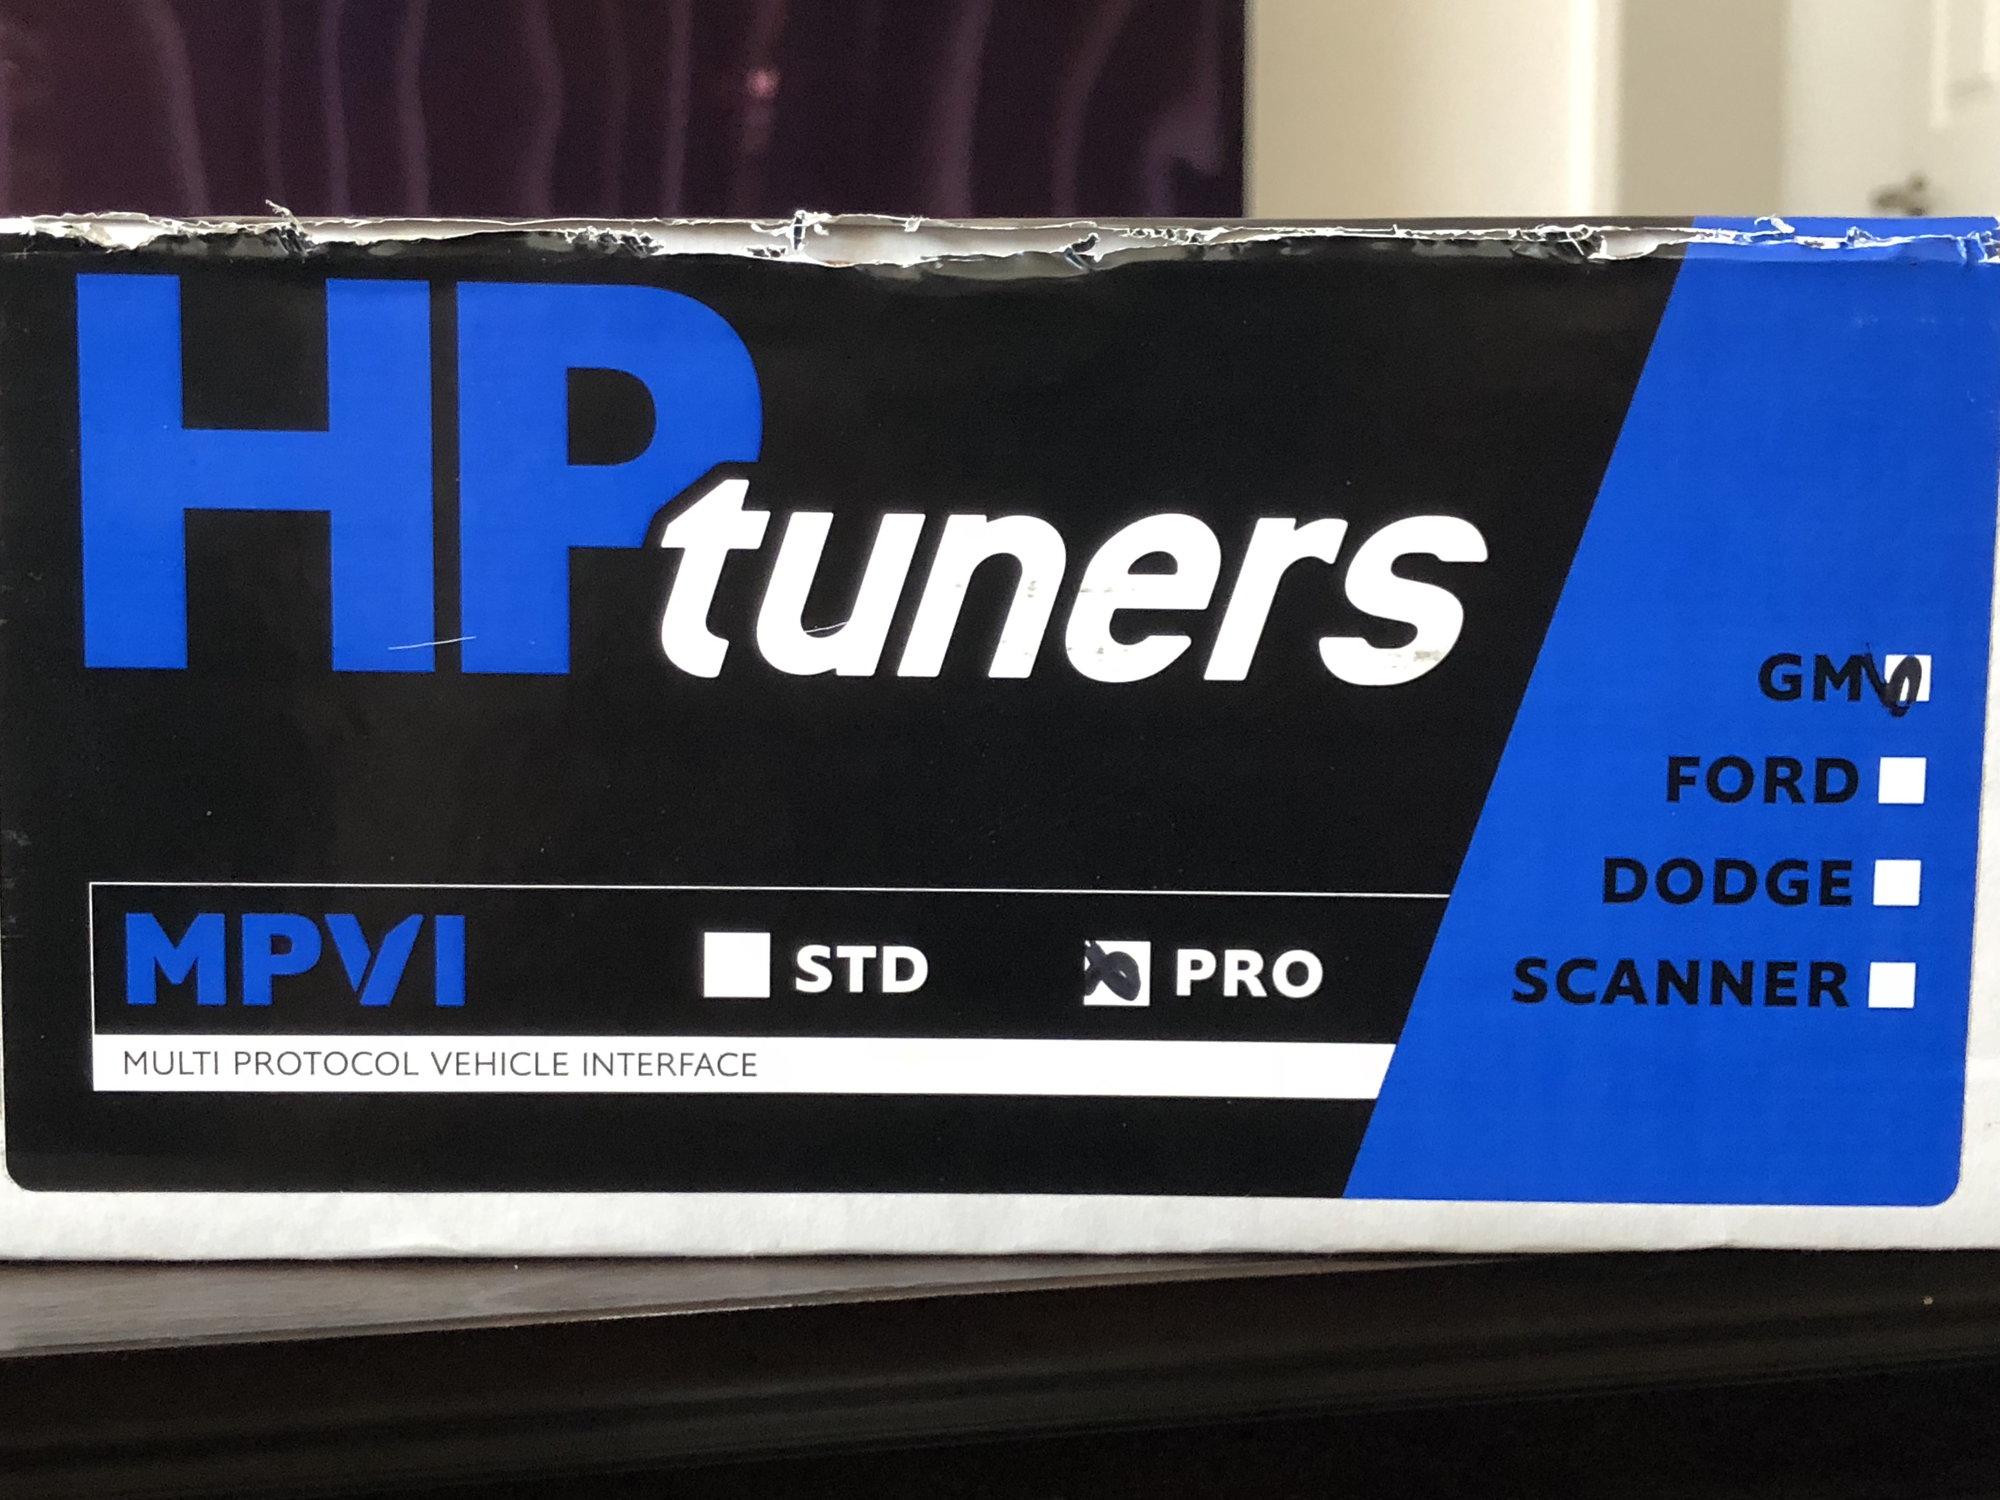 FS (For Sale) HPTuners MPV1 PRO - CorvetteForum - Chevrolet